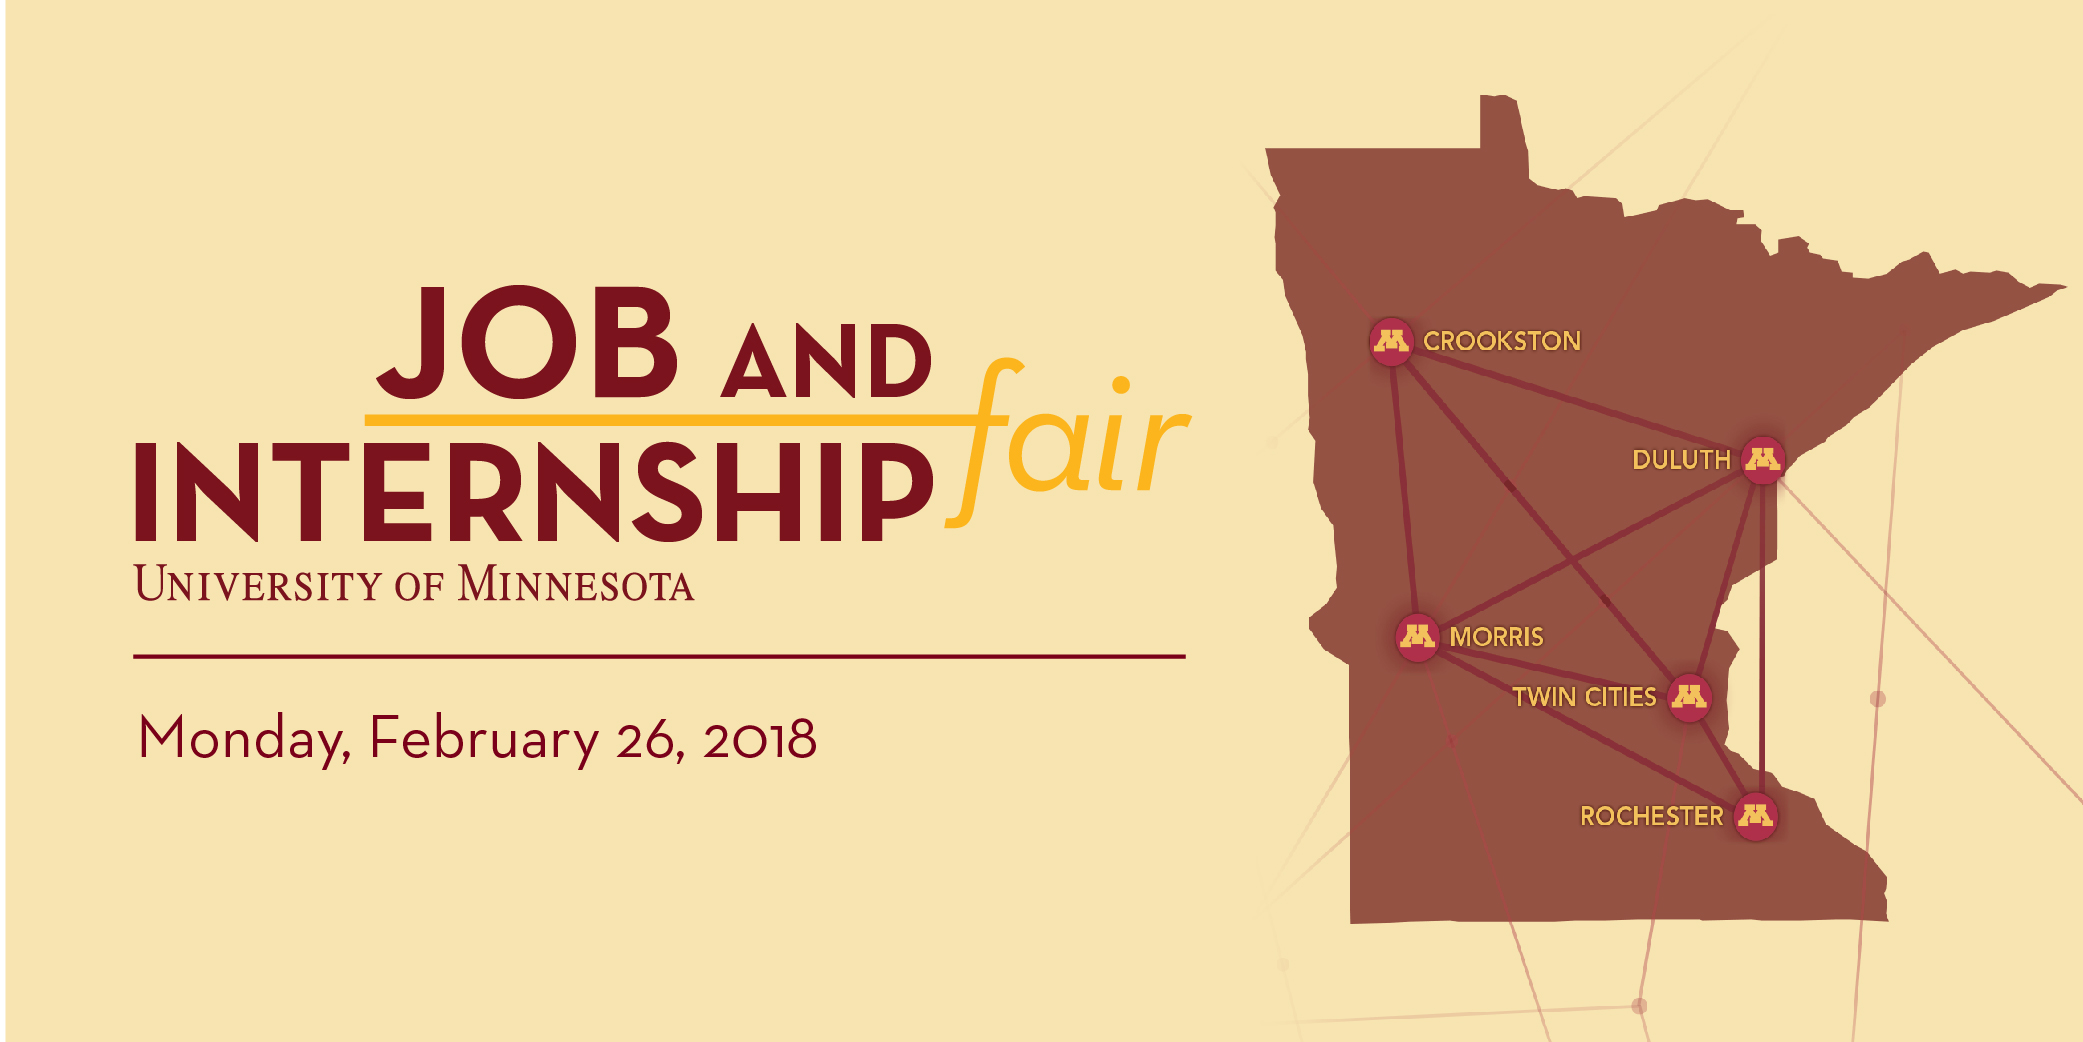 UMN Job & Internship Fair with Minnesota Map